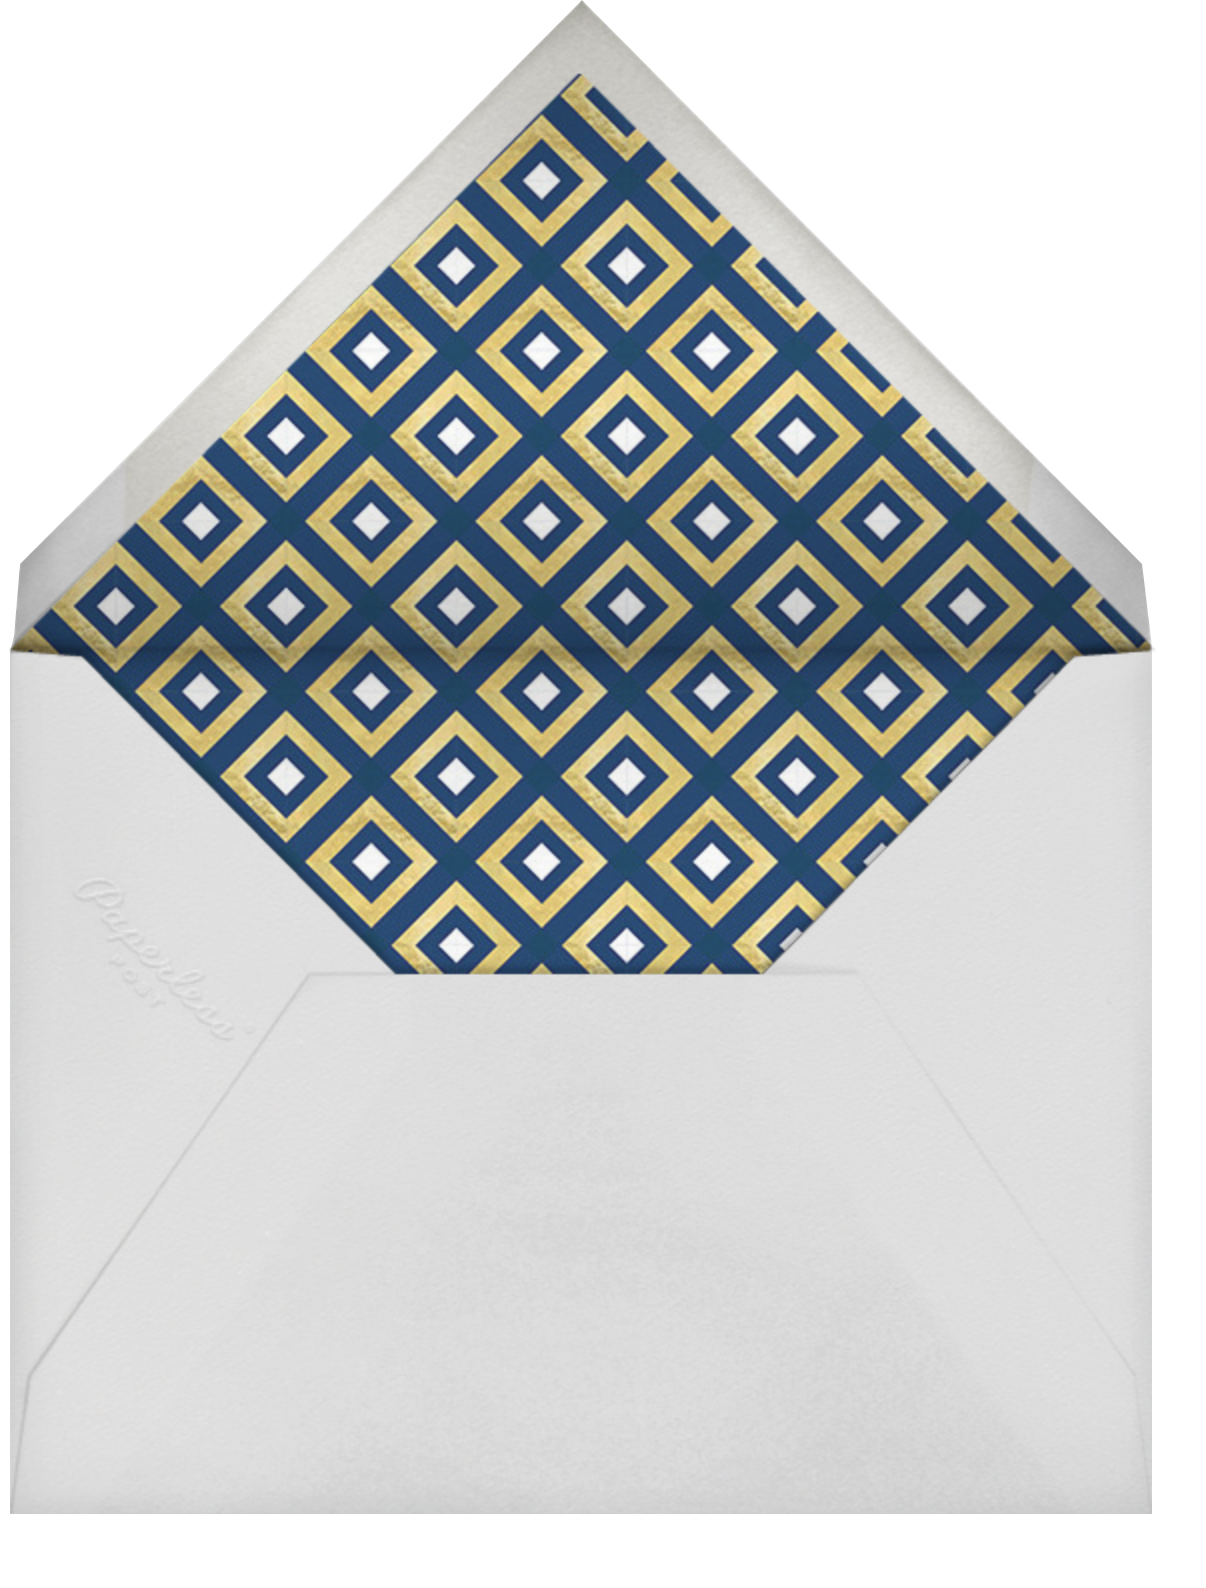 Bobo - Gold and Navy Blue - Jonathan Adler - Bar and bat mitzvah - envelope back